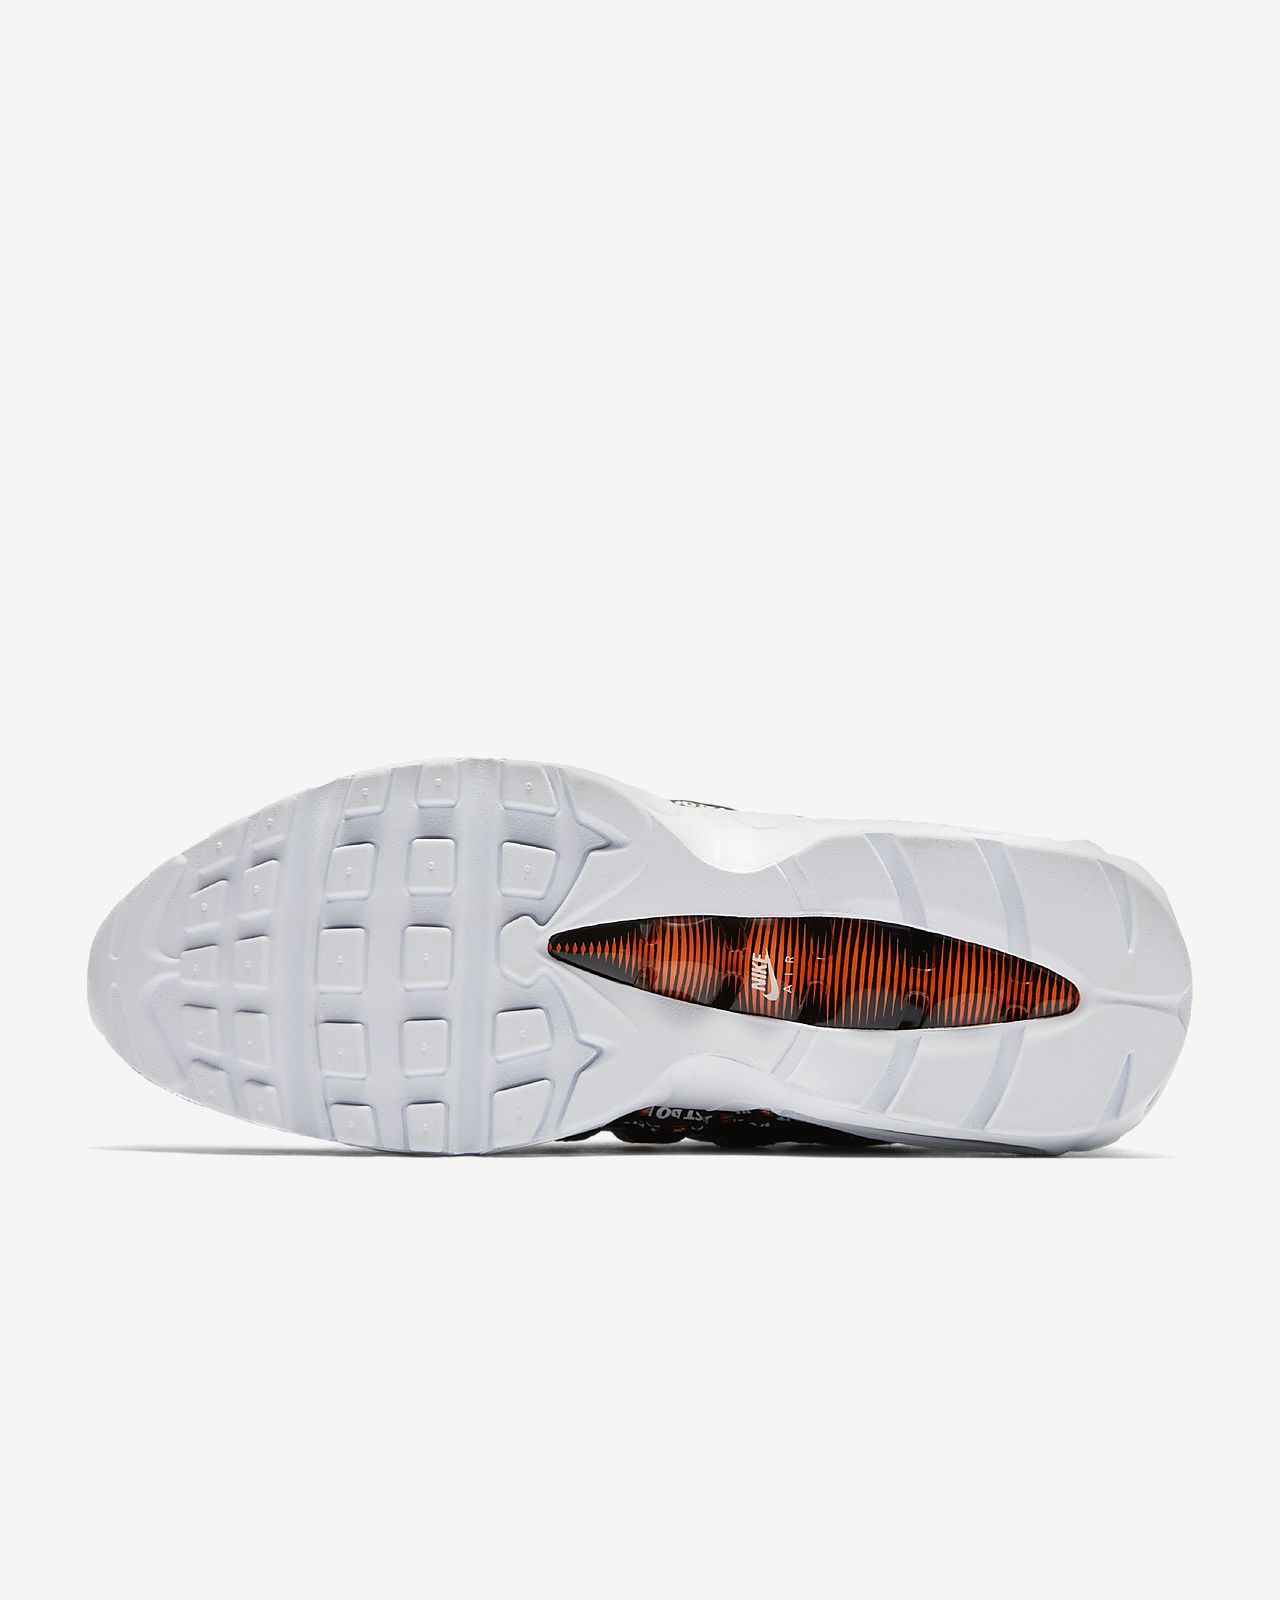 61d8d1e693 Nike Air Max 95 SE Men's Shoe. Nike.com IE